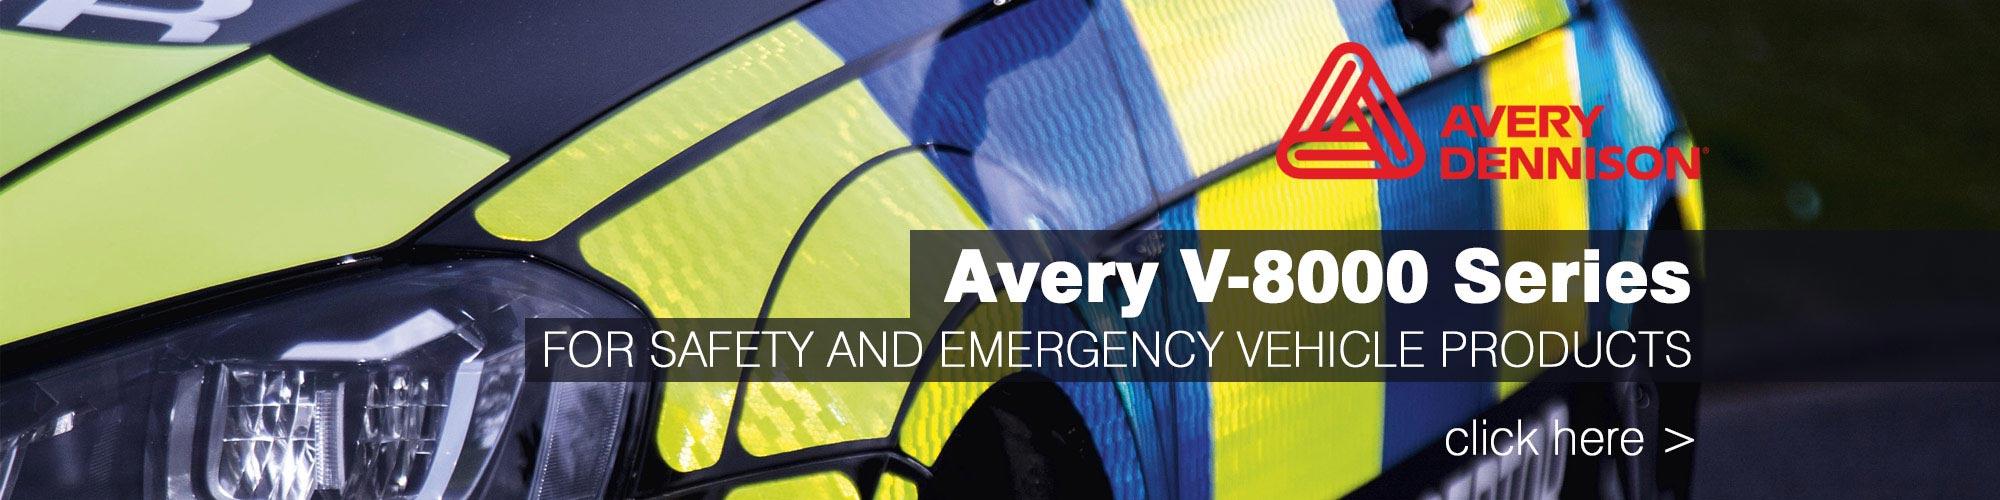 Victory Design - Avery V-8000